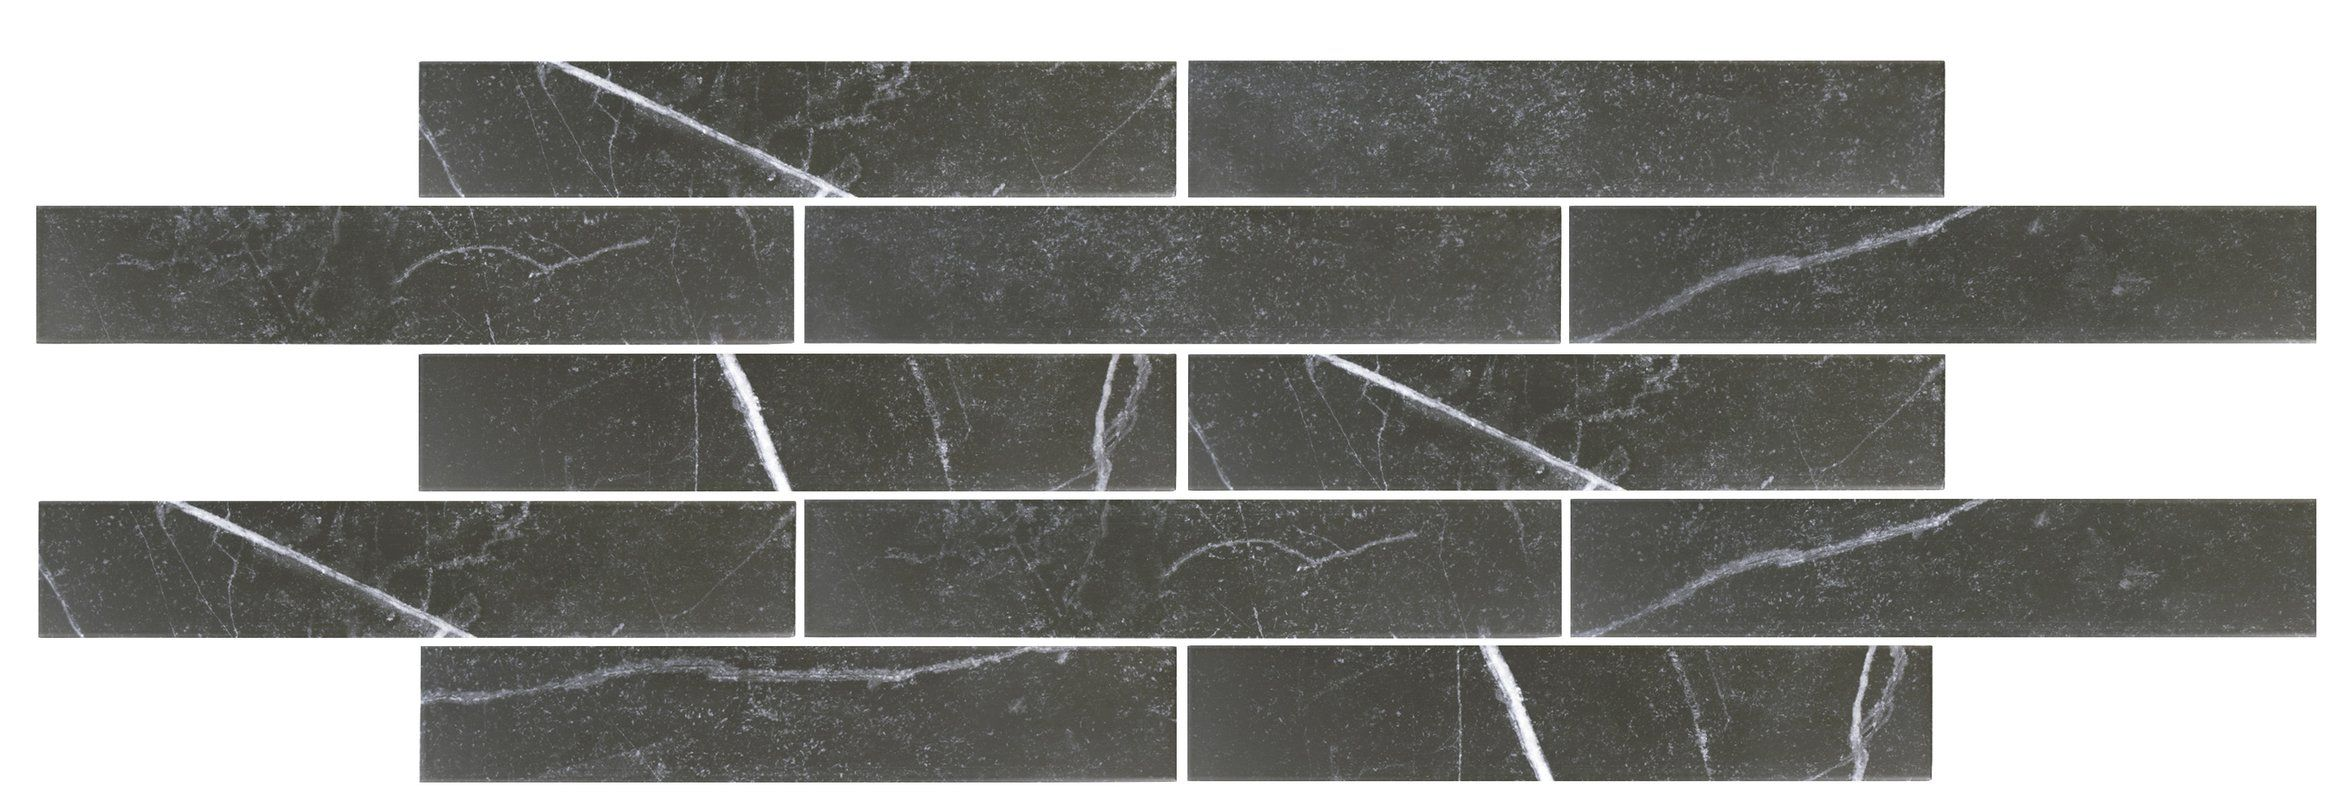 Delos 3 13 X 17 38 Porcelain Field Tile In Black Natural Stone Tile Tile Floor Bathroom Flooring